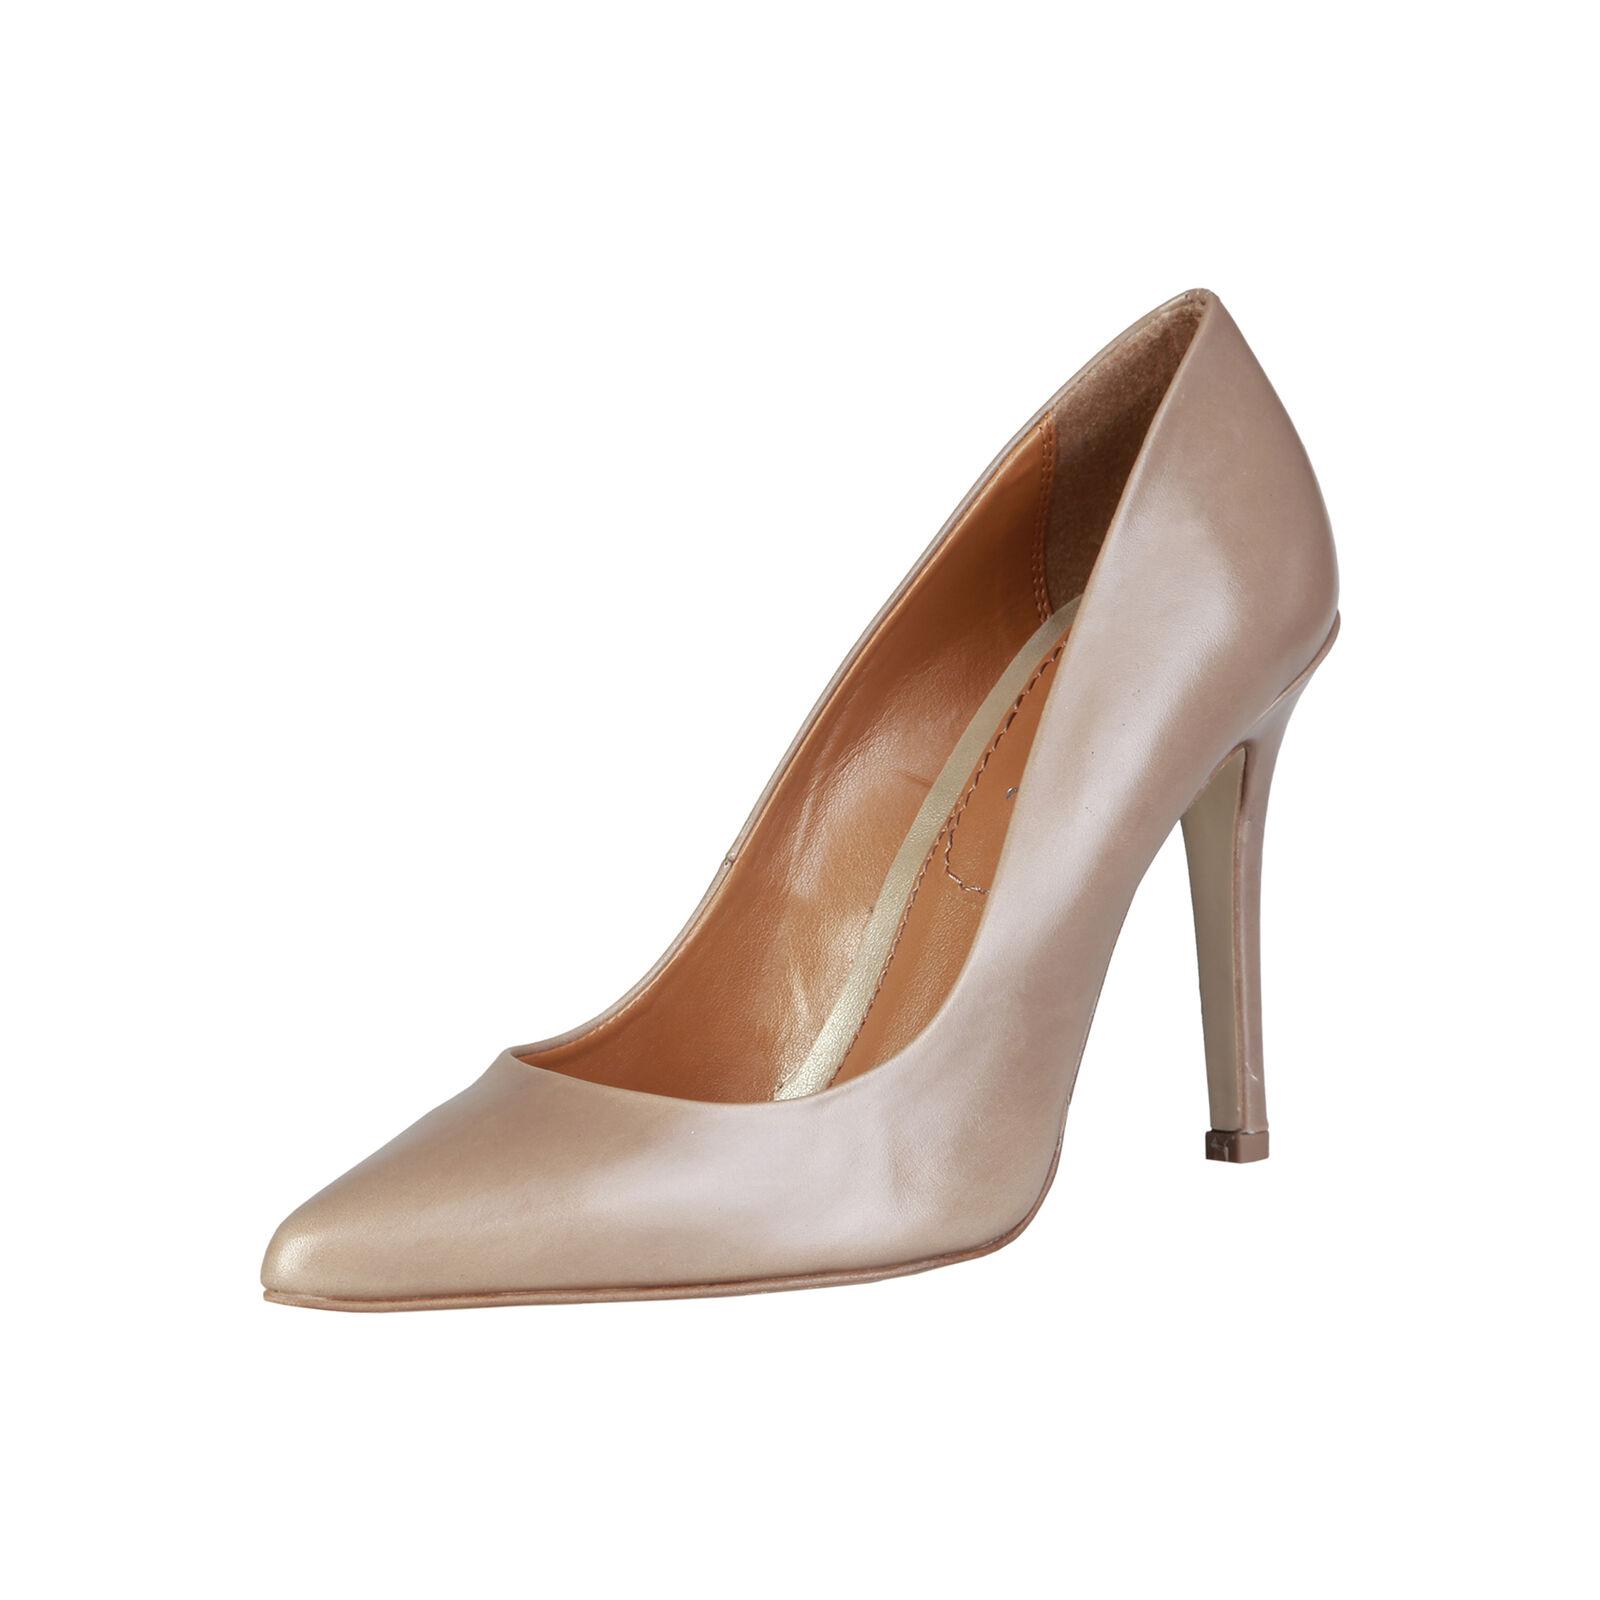 Pierre Cardin zapatos señora zapatos de salón tacón alto stilettos cuero genuino